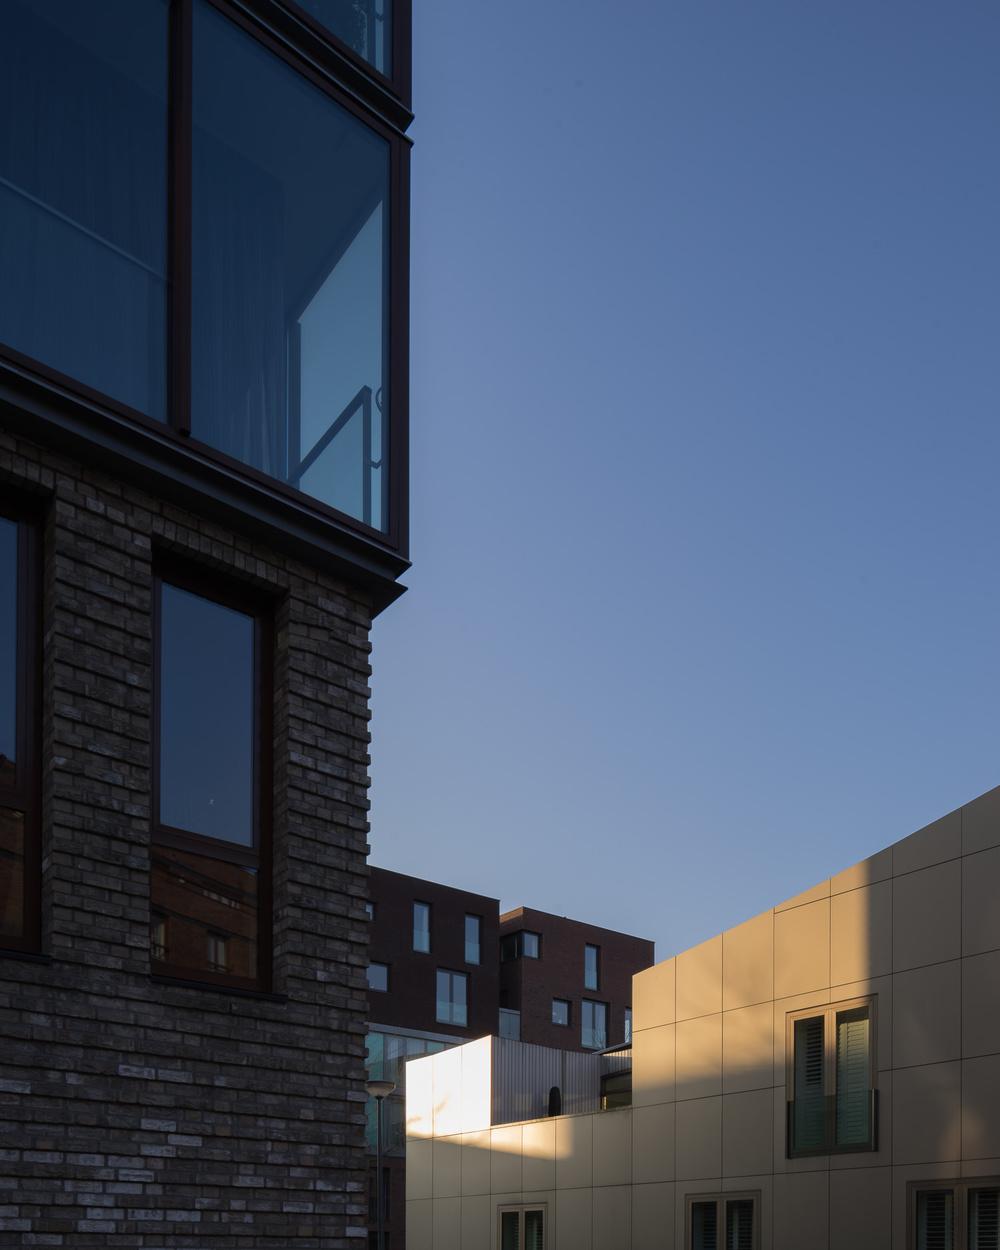 amsterdam-modern-architecture-facade-het-funen-mark-hadden-photography-architectuurfotograaf-005.jpg